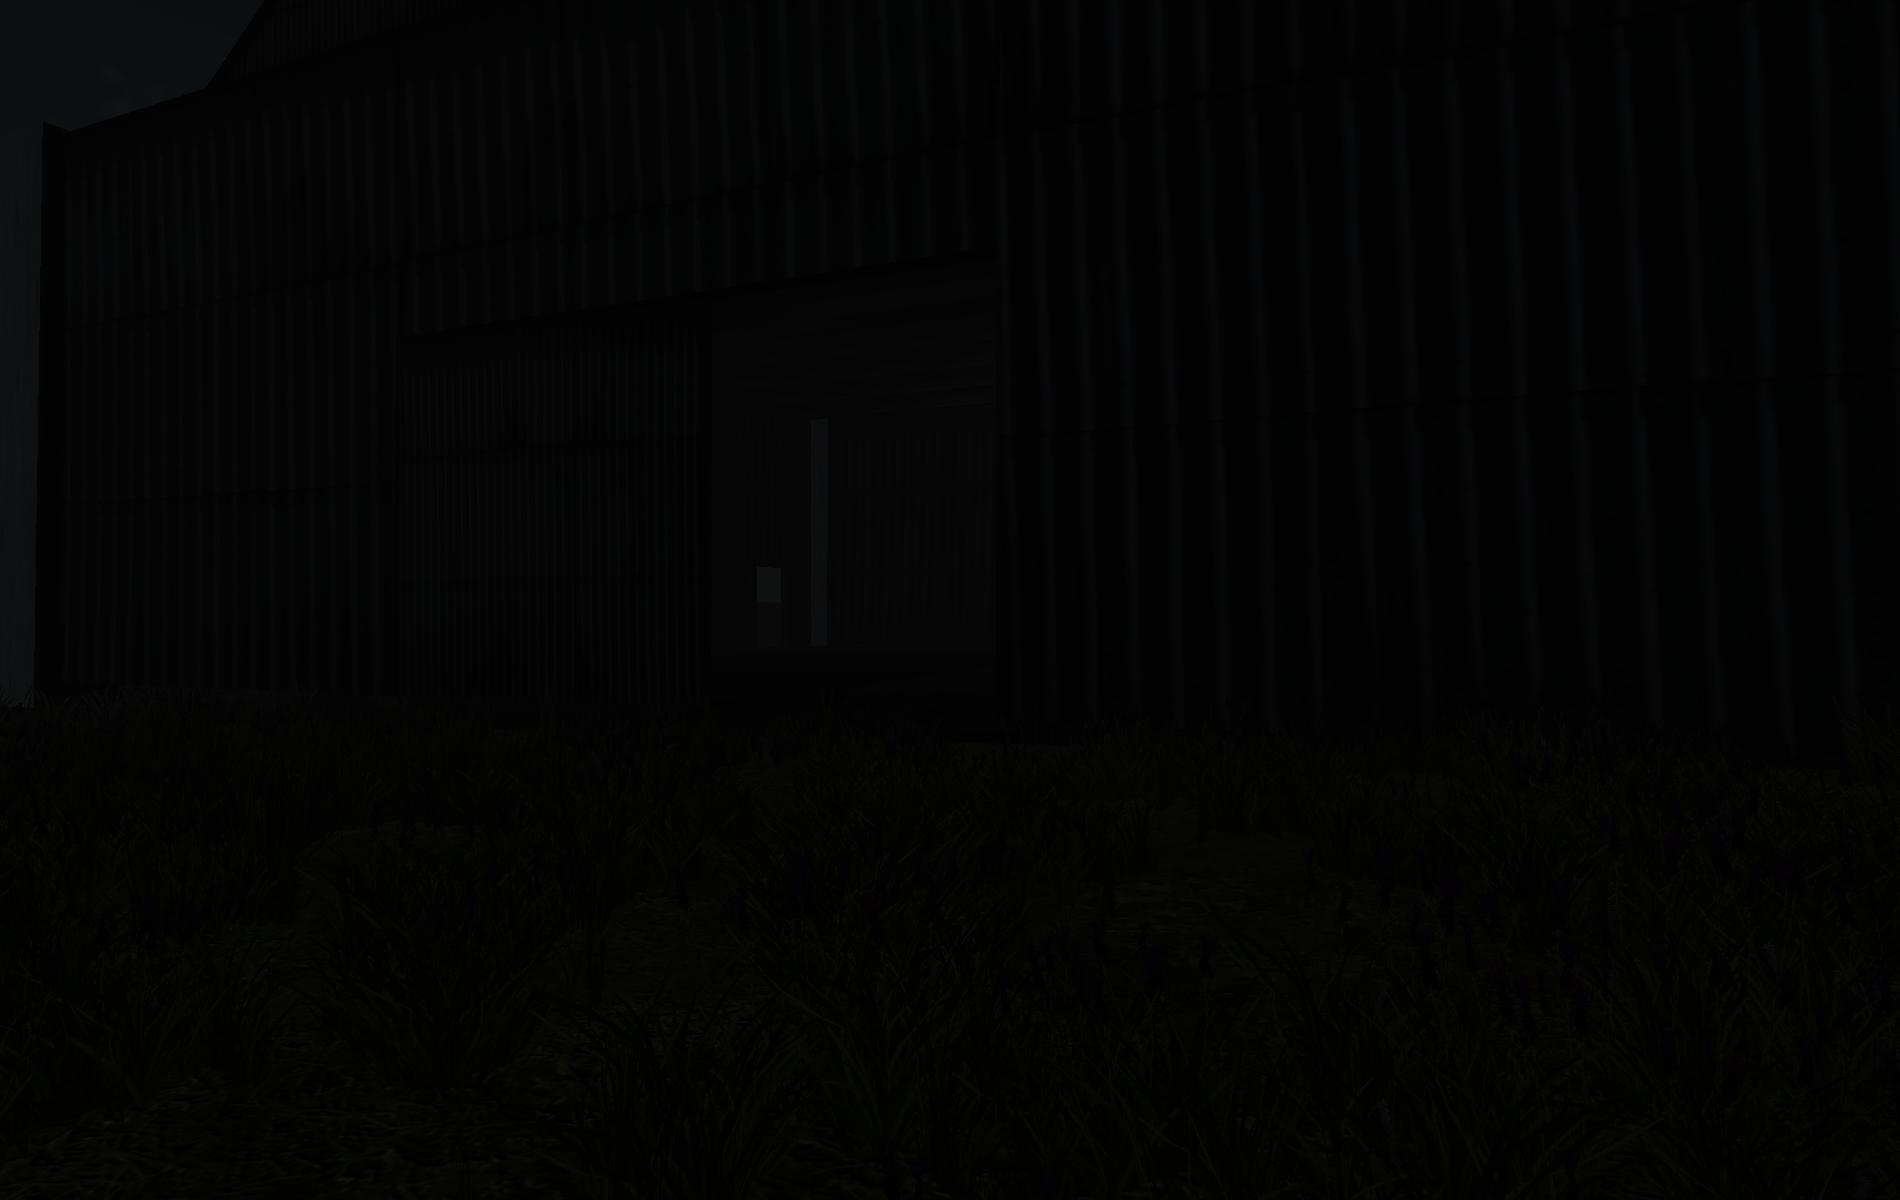 Night closeup view of Warehouse